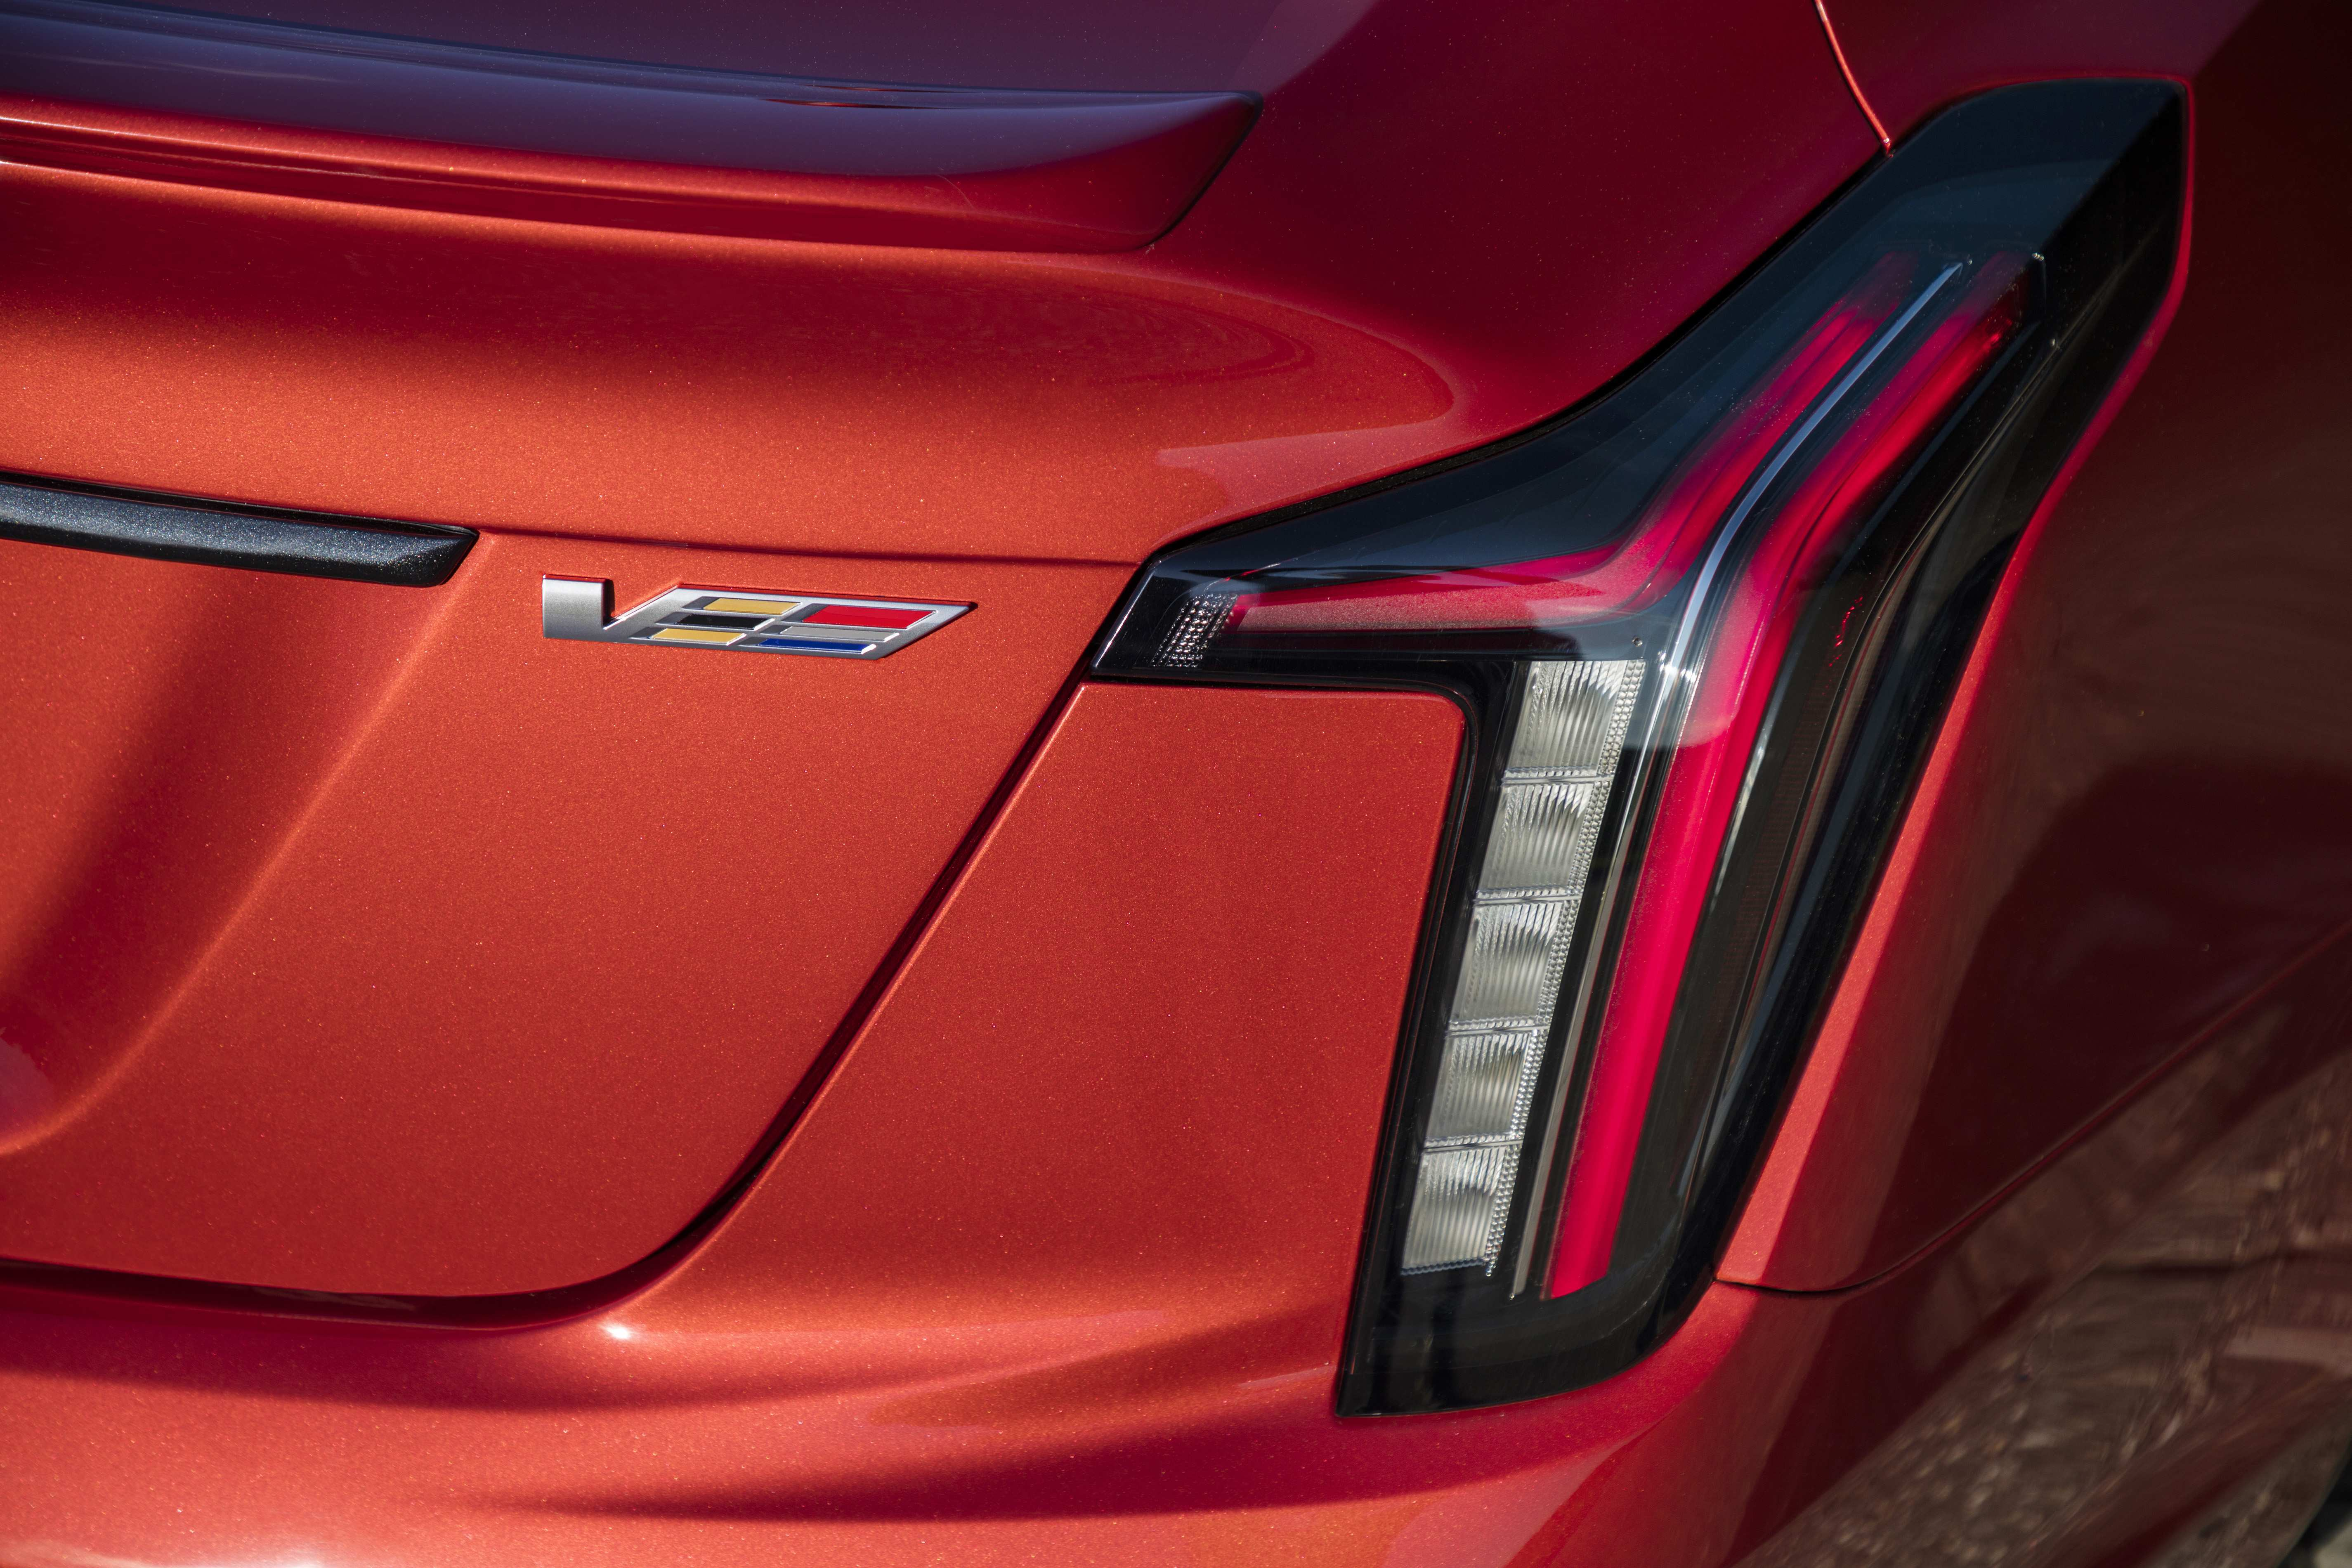 42 New Cadillac Supercar 2020 Style with Cadillac Supercar 2020